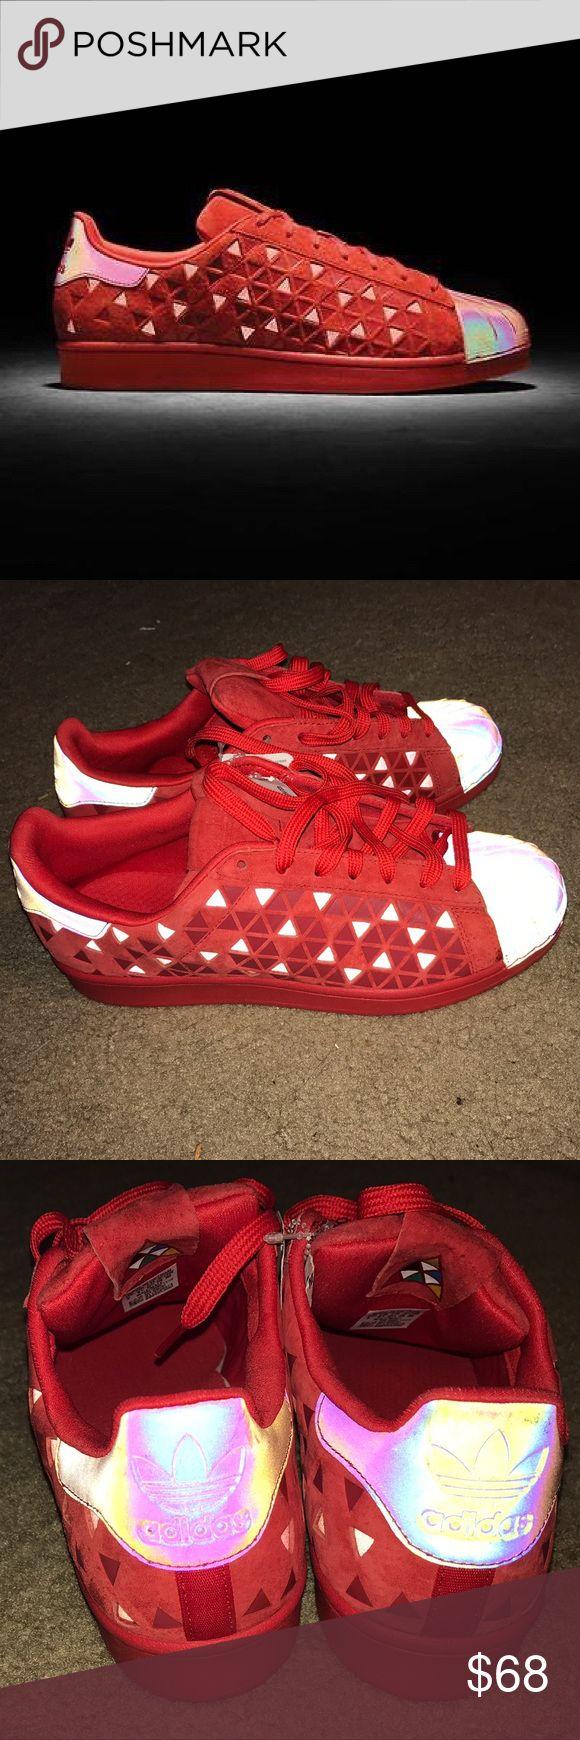 Adidas Superstar Adidas Nmd Uomini 11